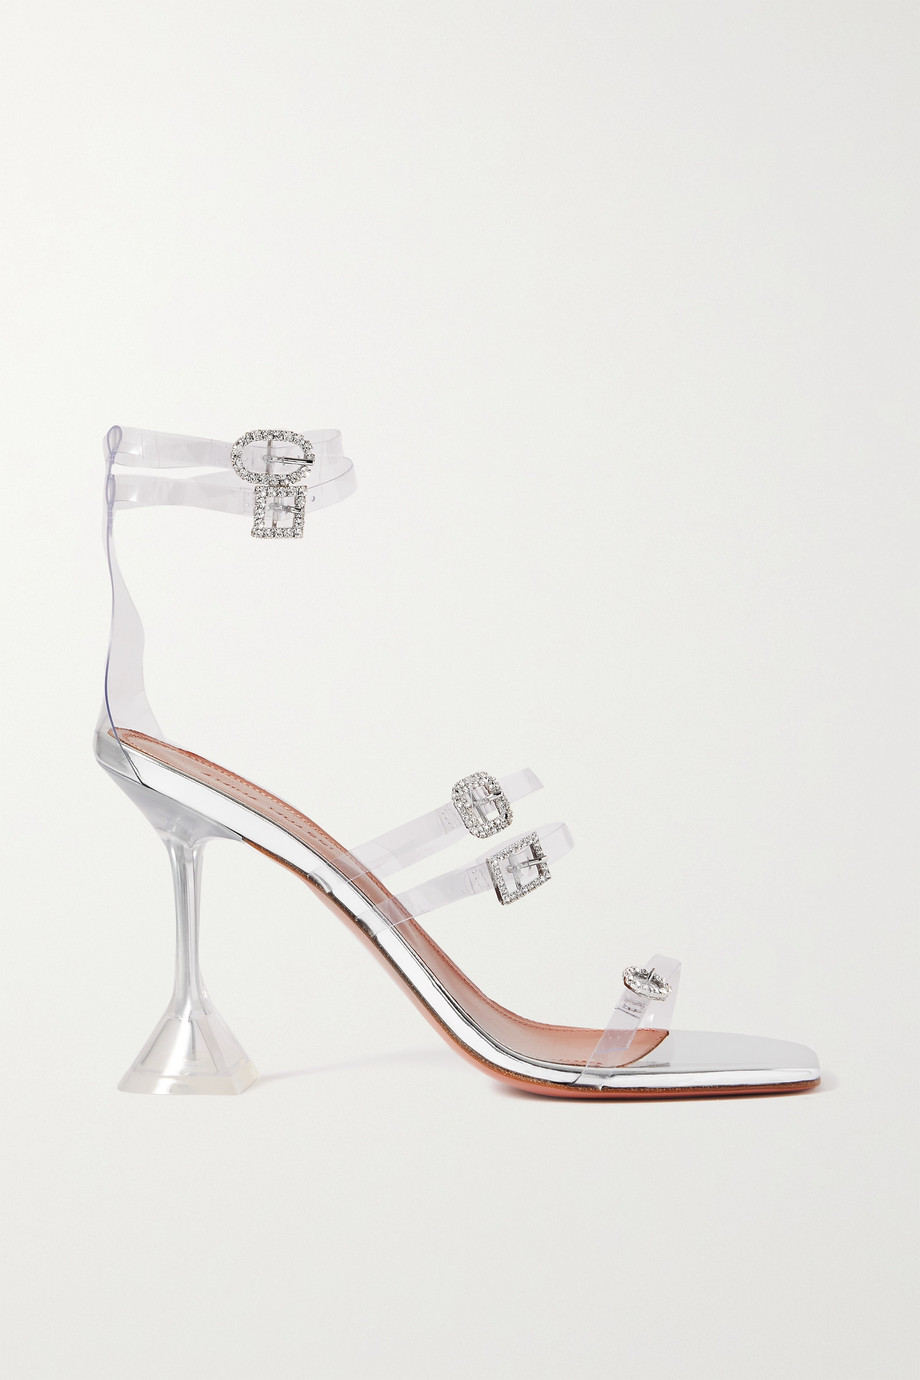 Amina Muaddi Sandales en PVC à cristaux Robyn